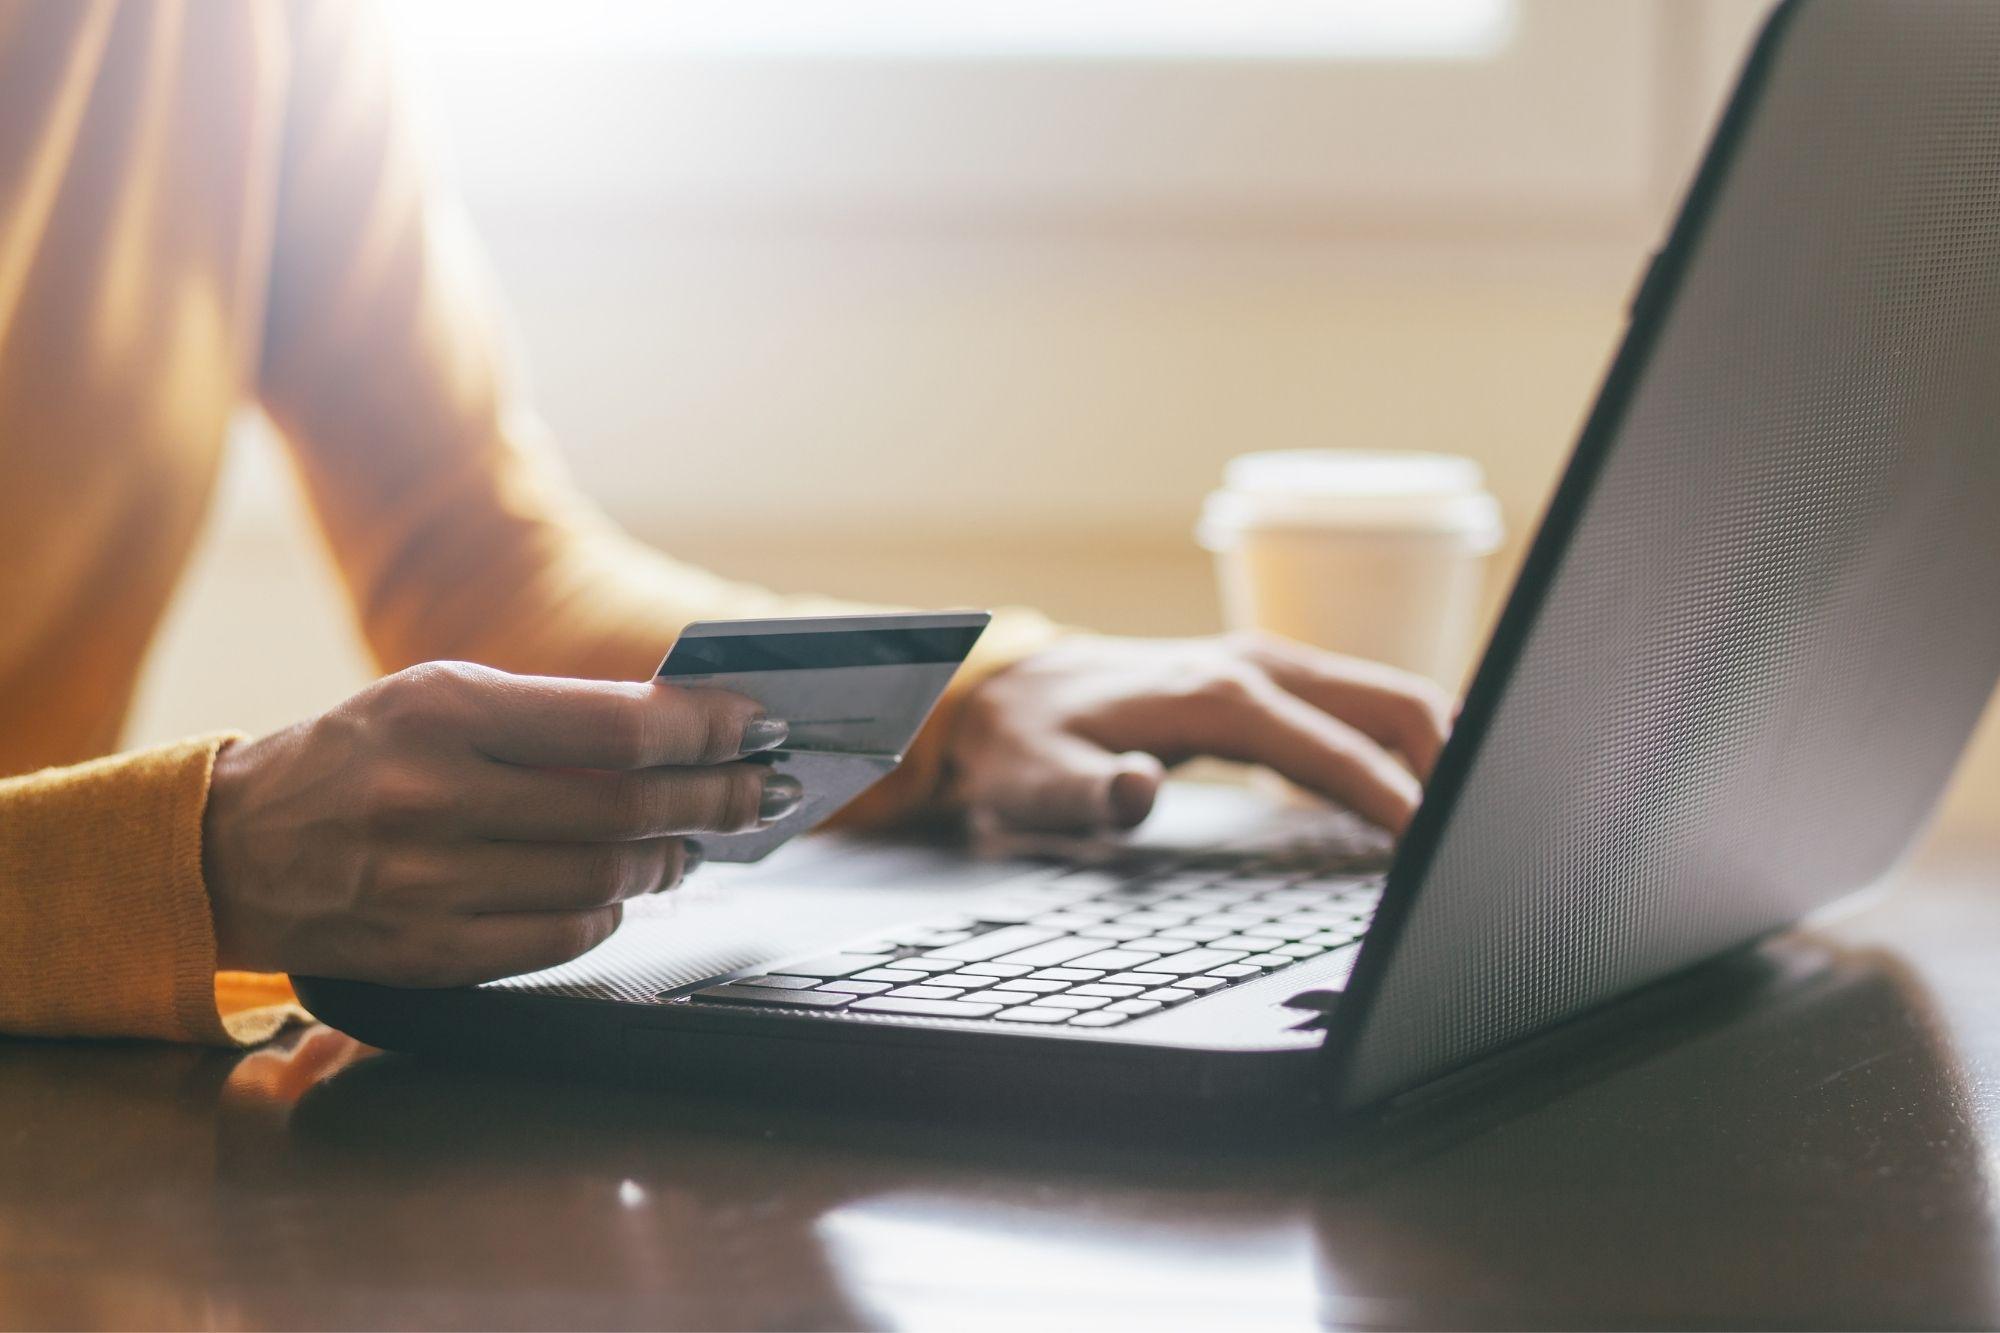 woman holding credit card at computer